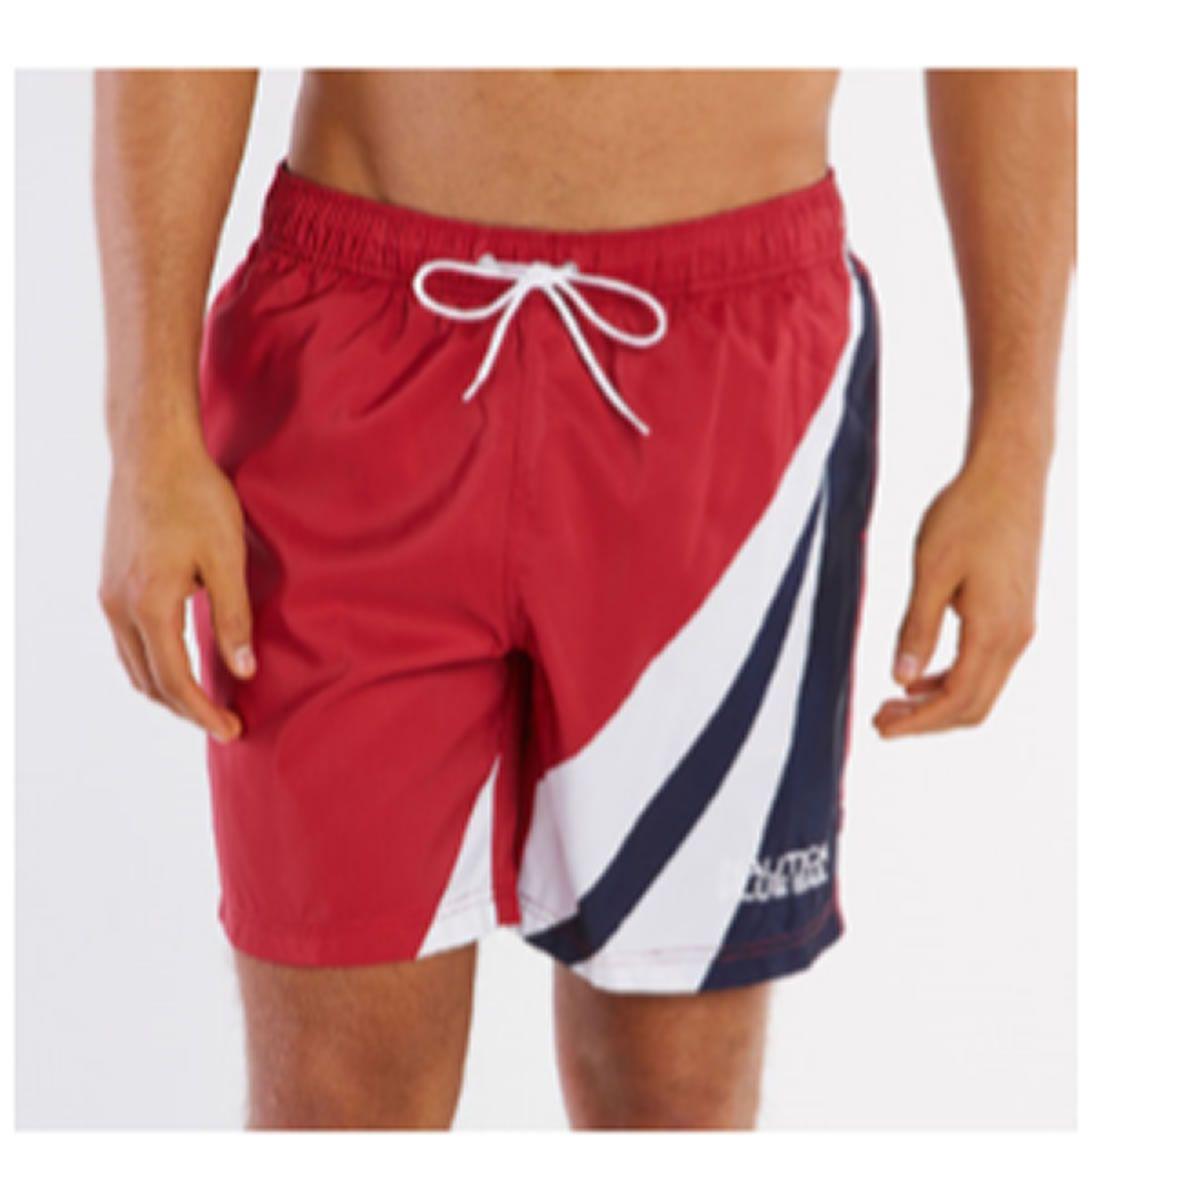 a5db503e919 Nautica for Men - Men s Clothing - Macy s